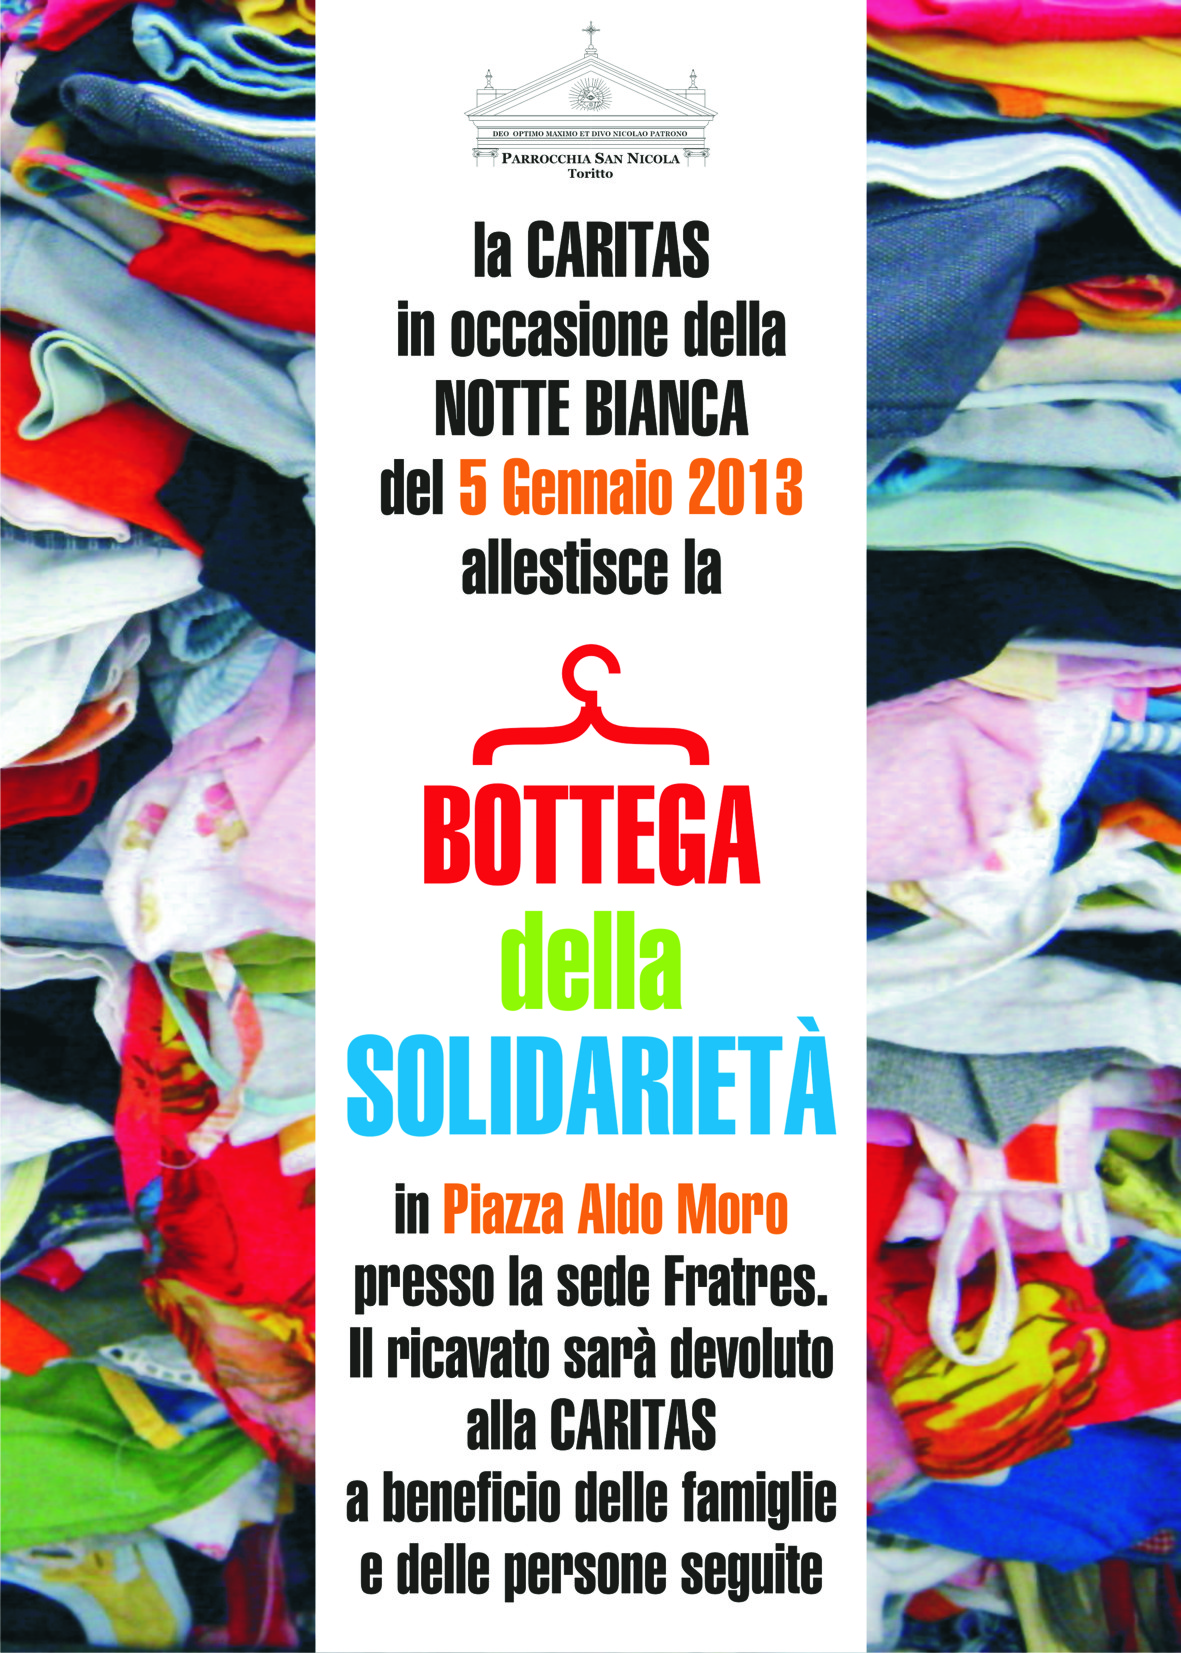 locandina_bottega_della_solidariet.jpg